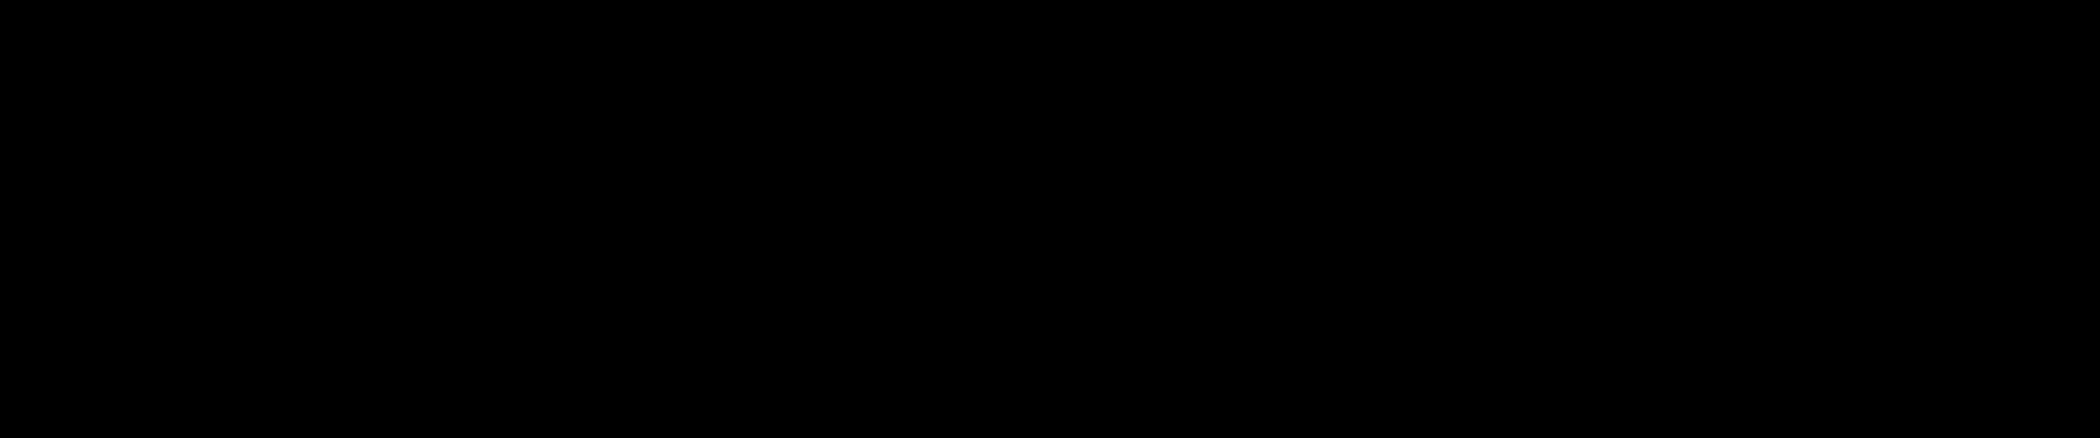 tdk logo 4 - TDK Logo